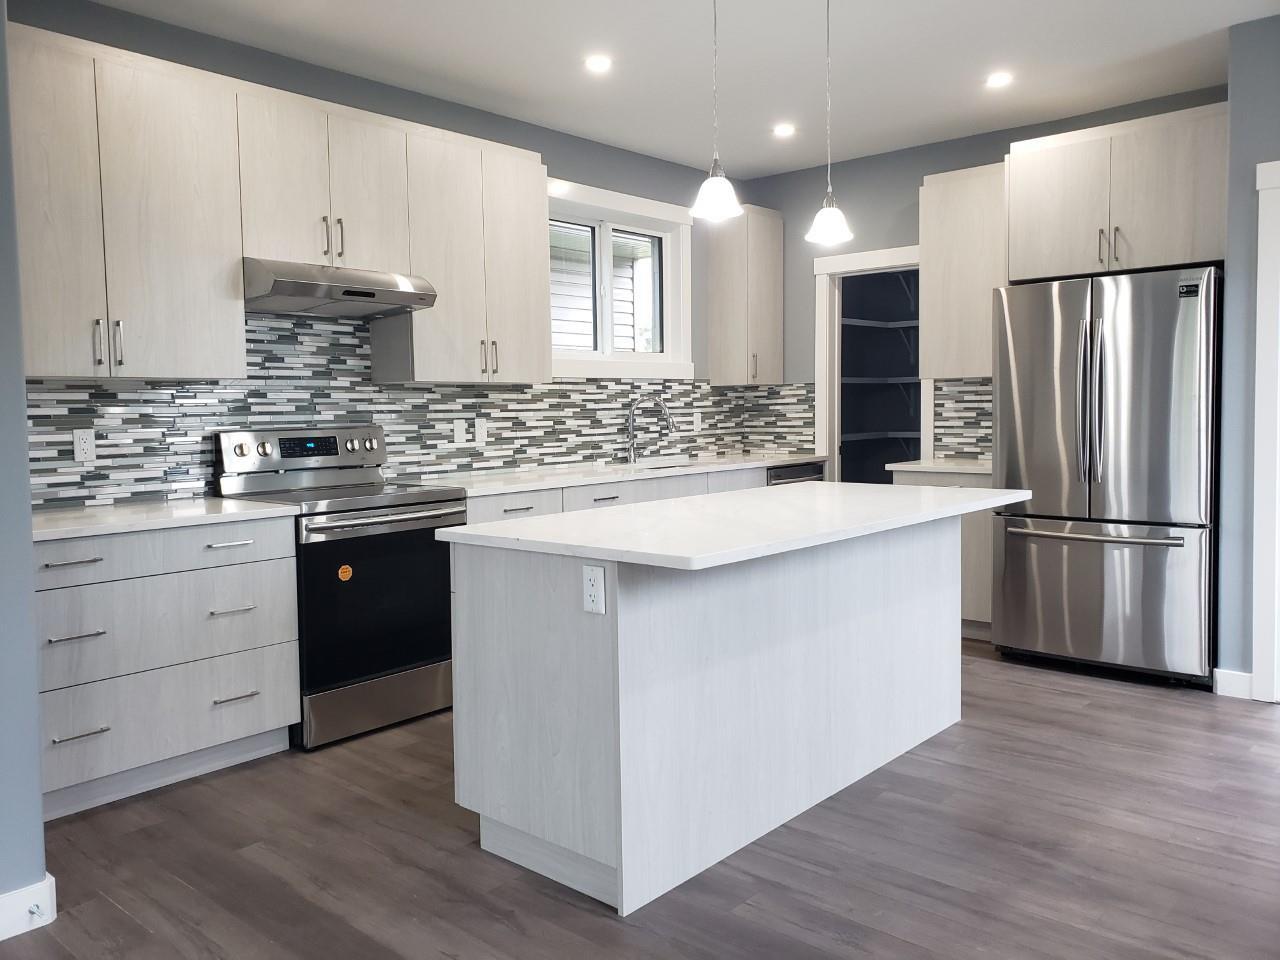 Main Photo: 9324 153 Street in Edmonton: Zone 22 House for sale : MLS®# E4162254